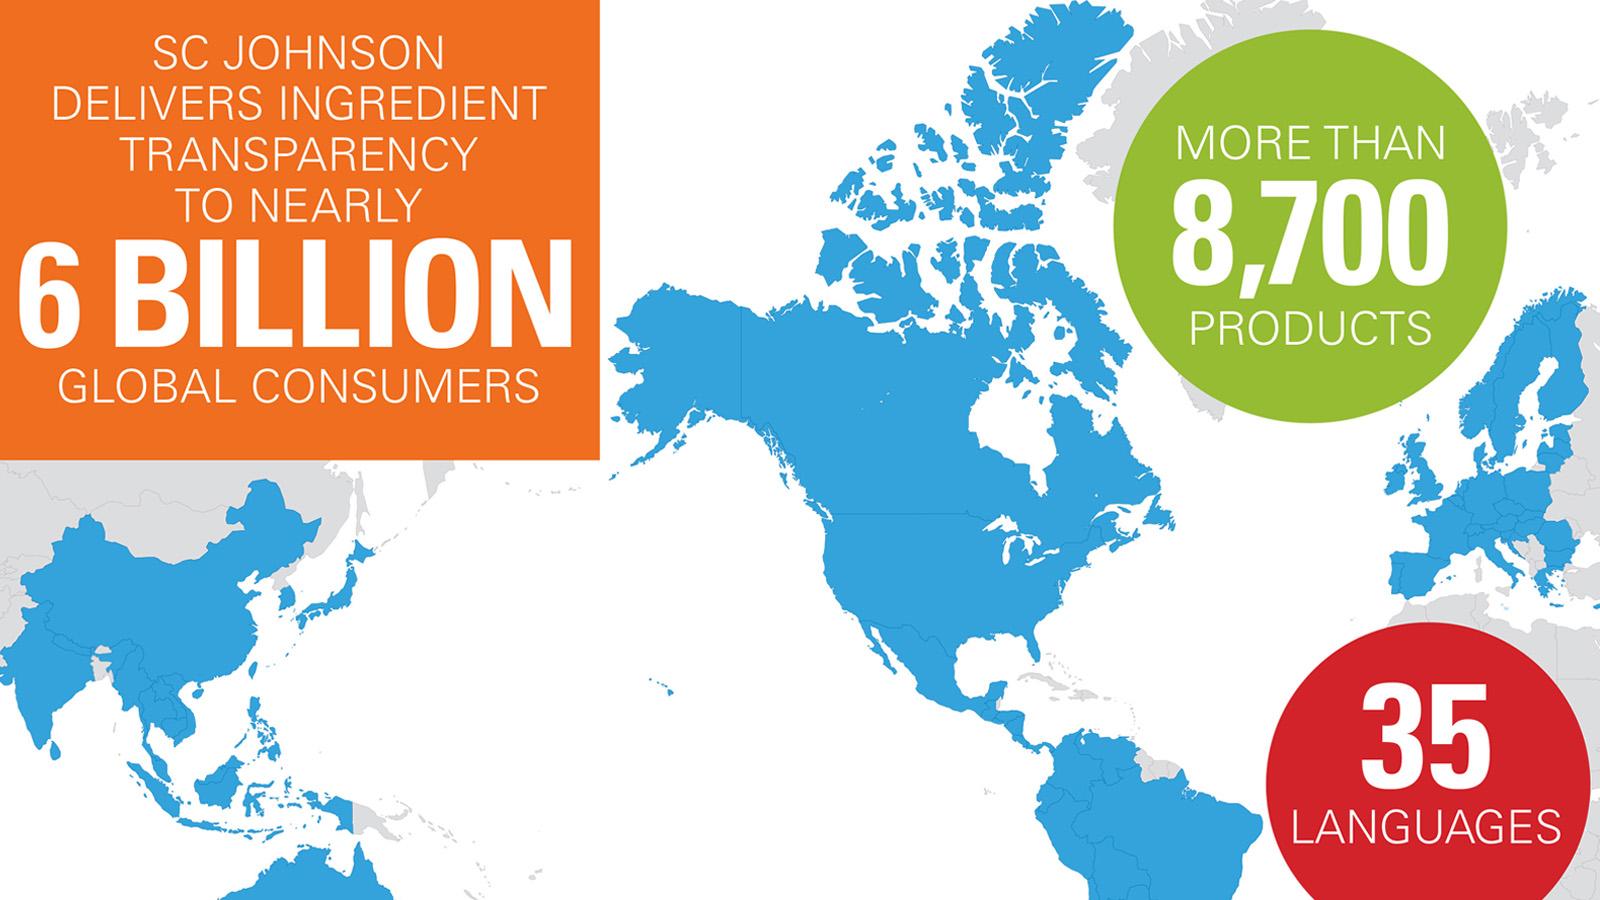 SC Johnson's global ingredient transparency.